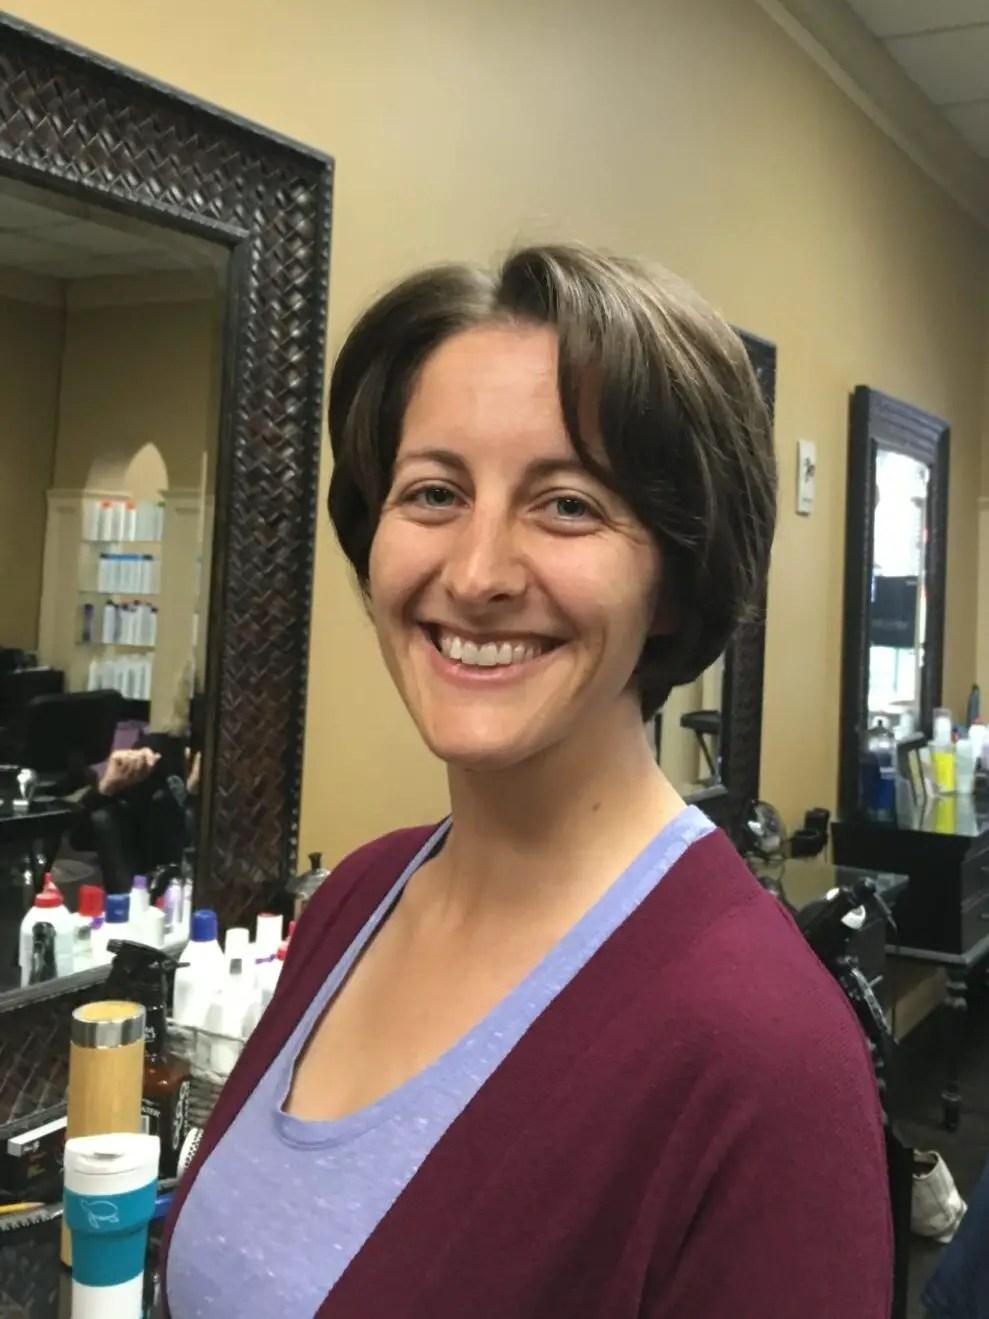 Amanda Walkins donating hair to Locks of Love (after)